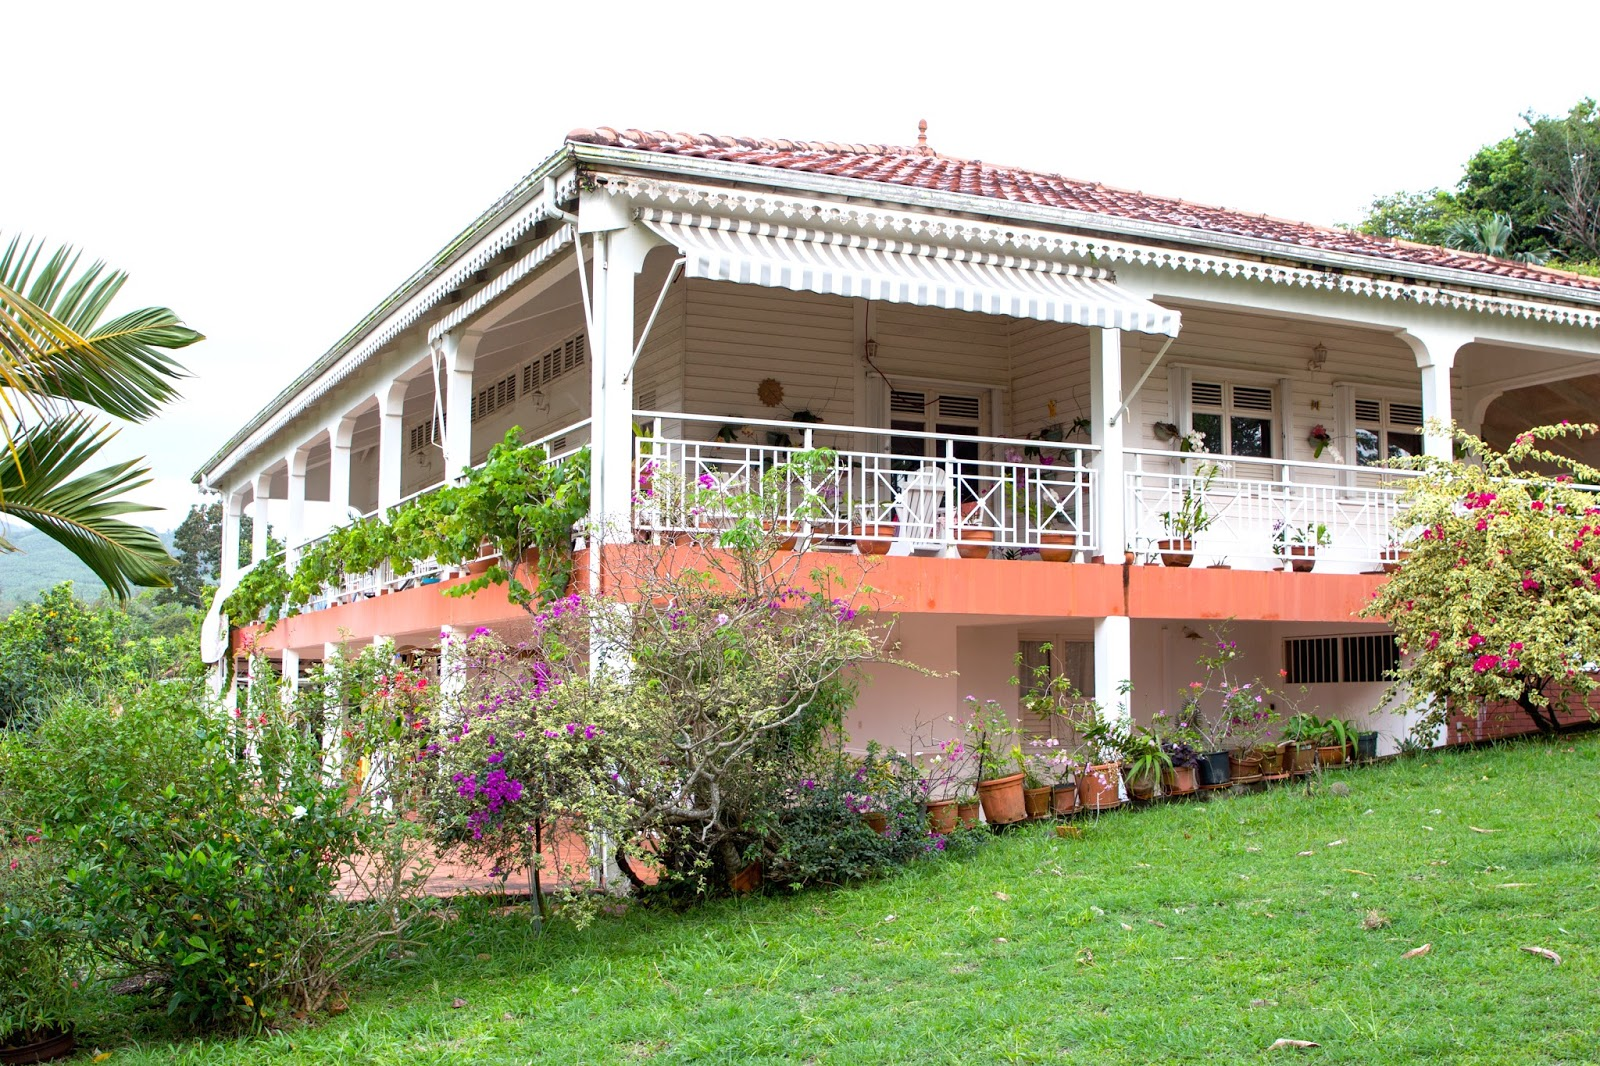 Maison Coloniale Martinique